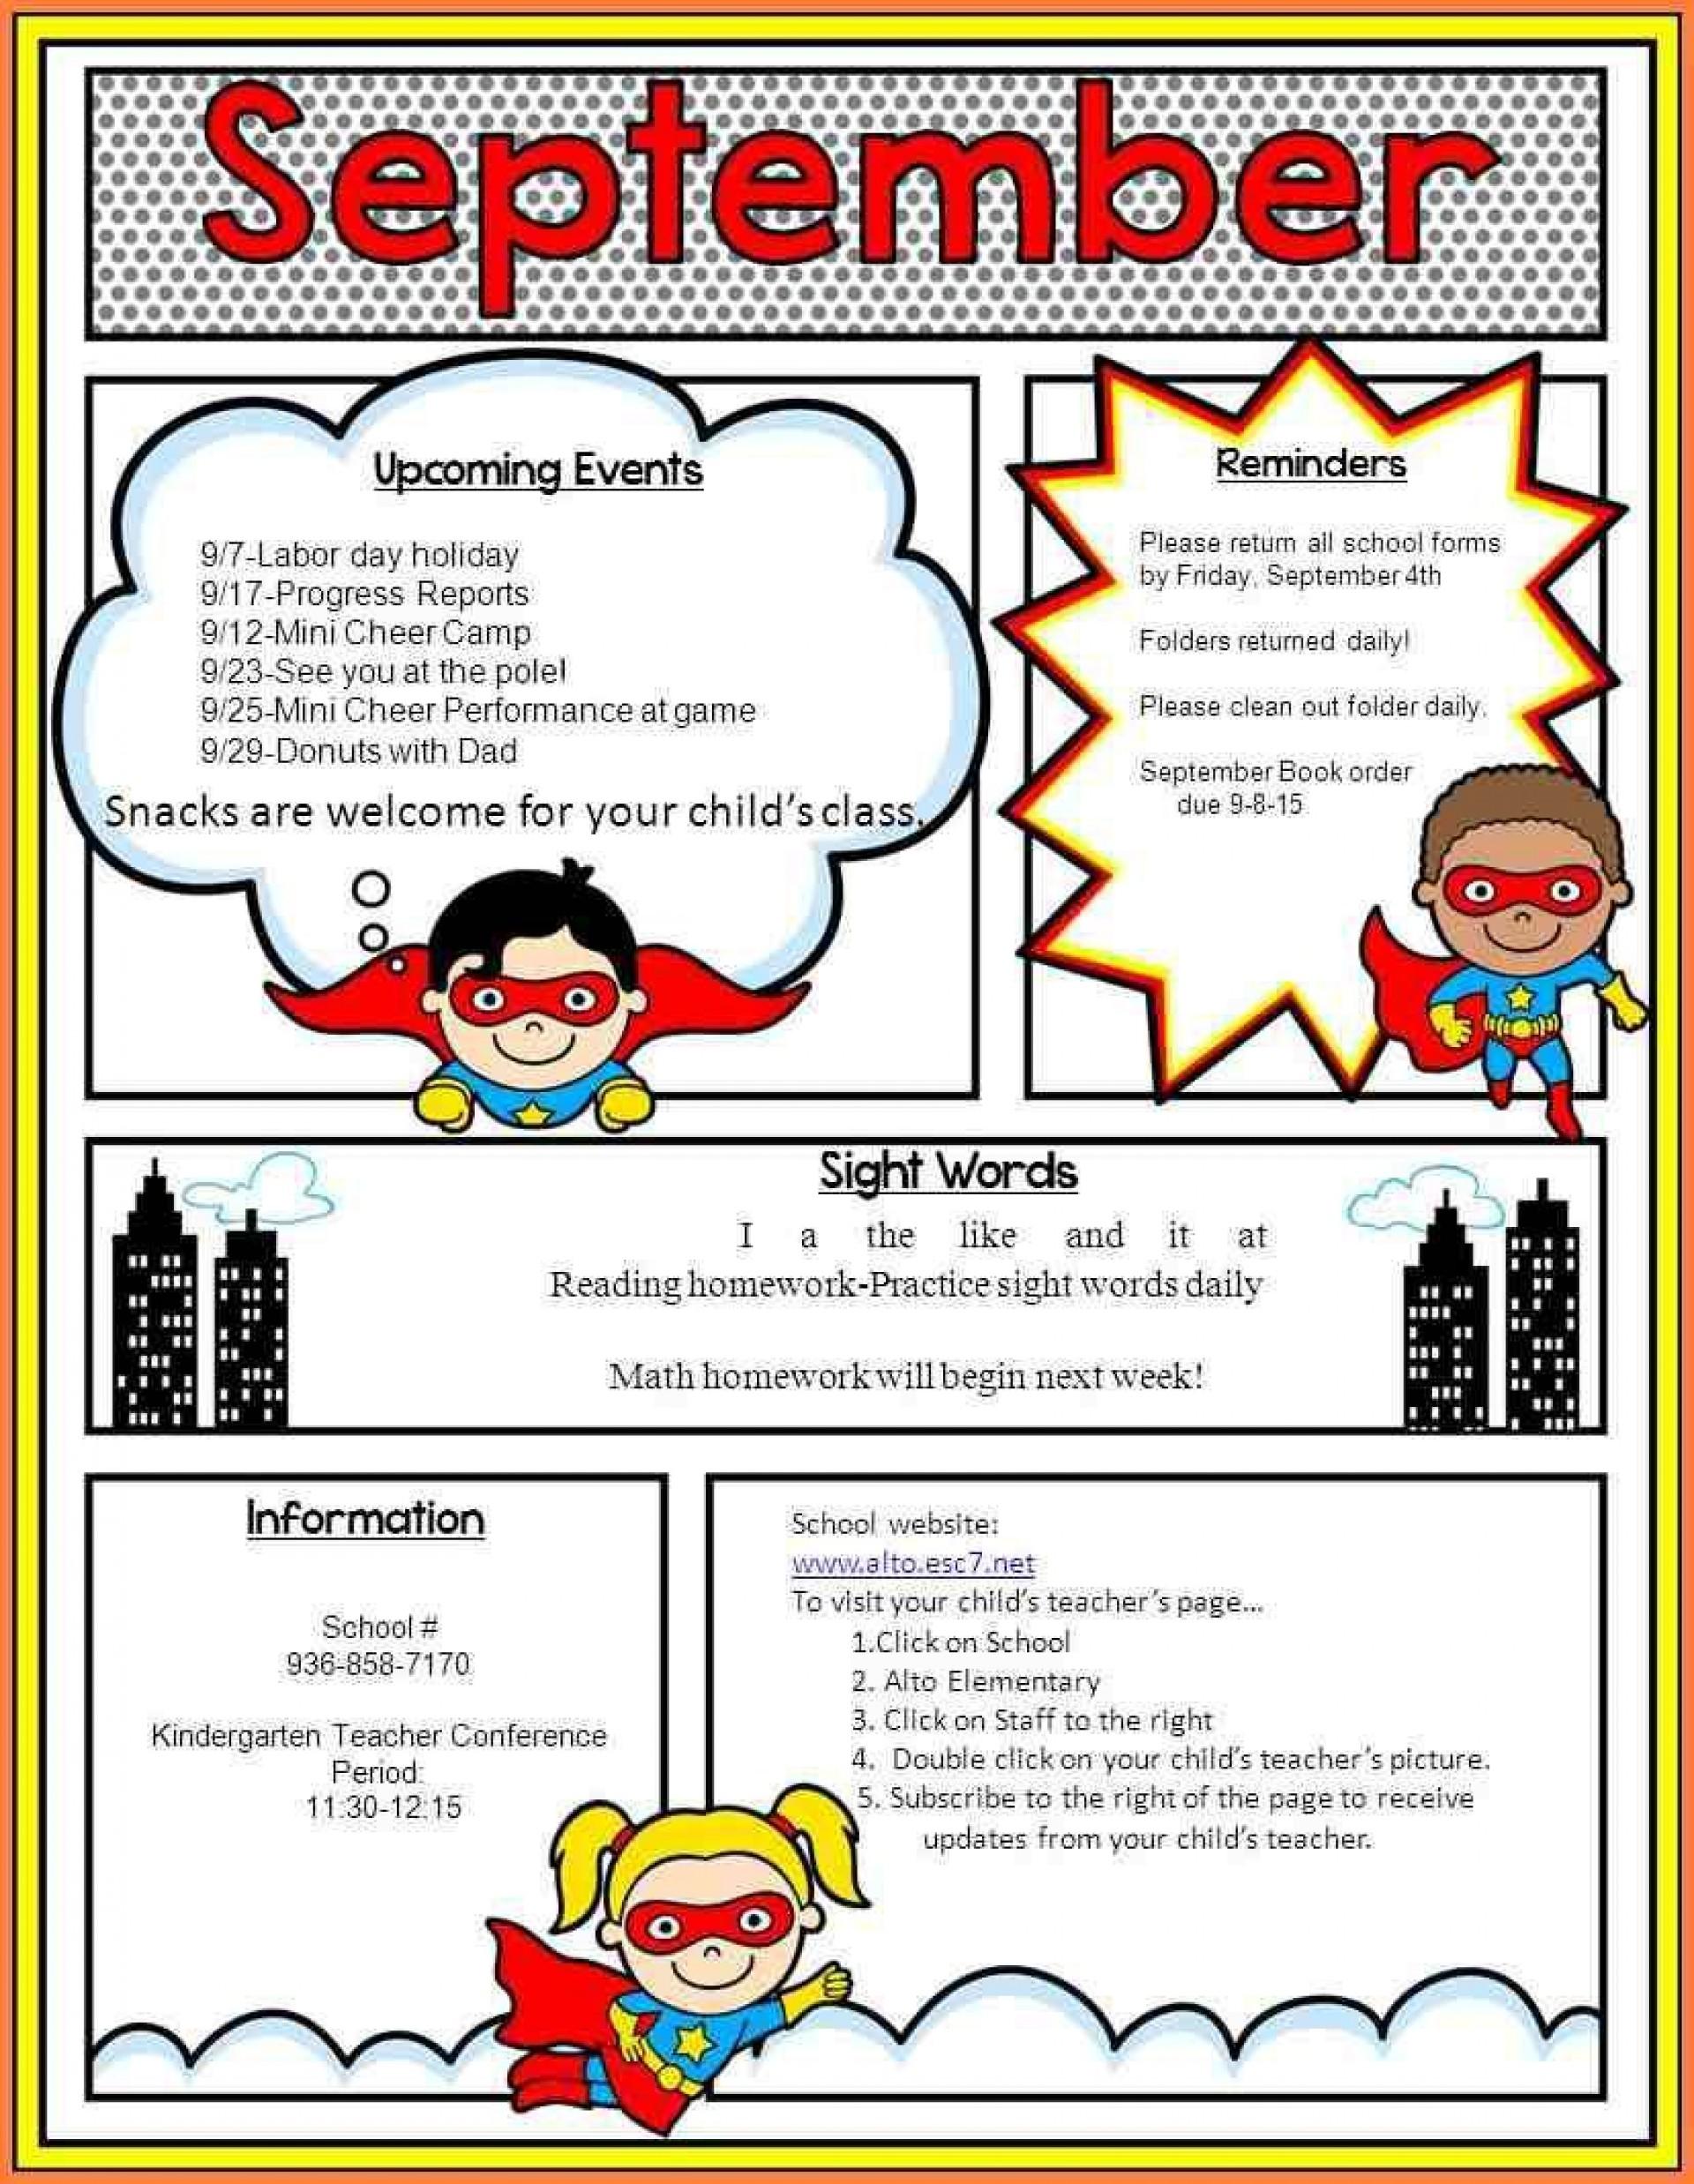 007 Fantastic Elementary School Newsletter Template Inspiration  Clas Teacher Free Counselor1920